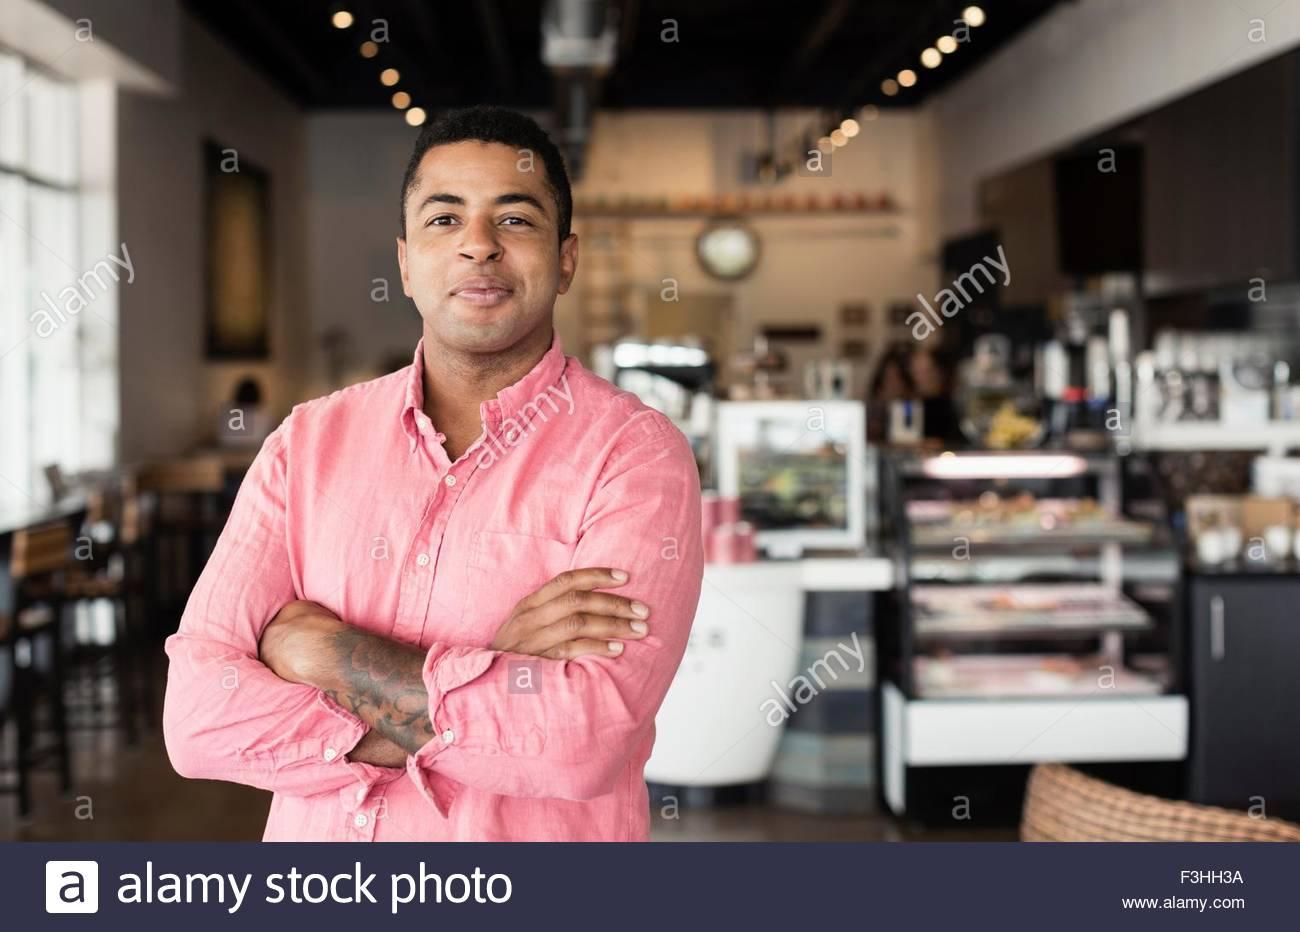 Porträt des jungen Mannes in Coffee-shop Stockbild